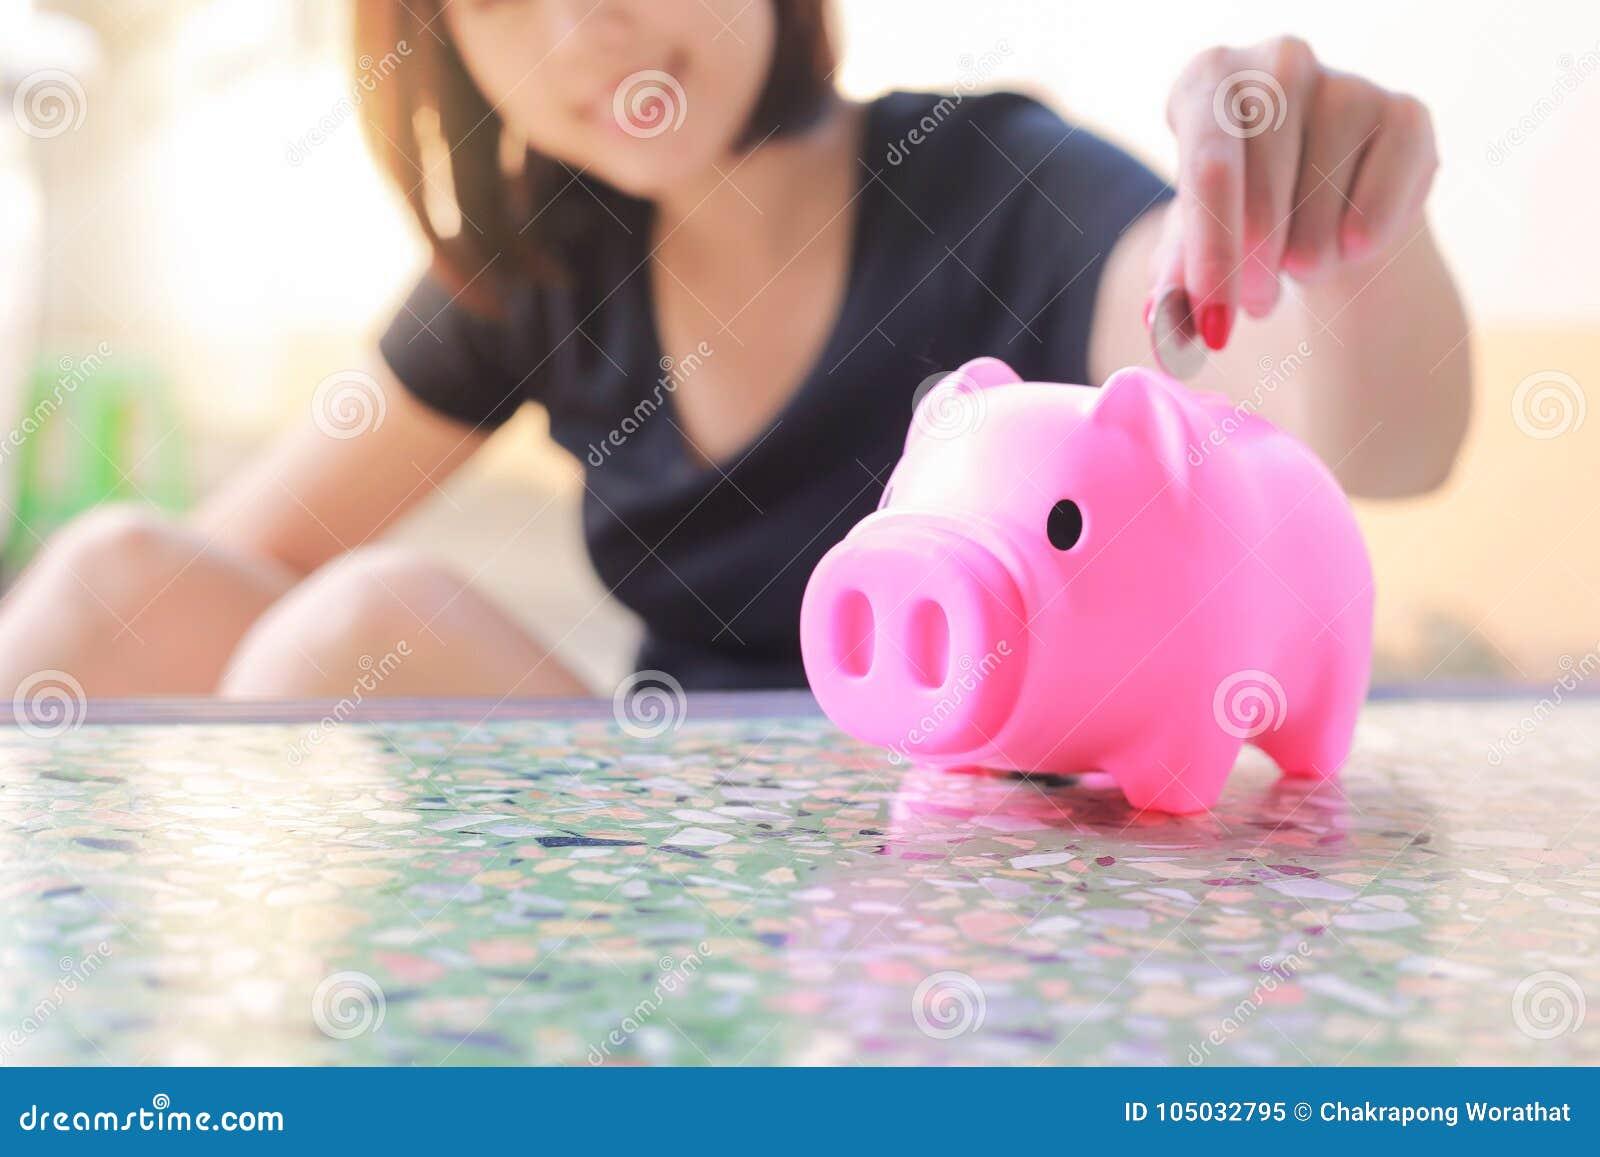 female hand putting money into piggy bank  stock image